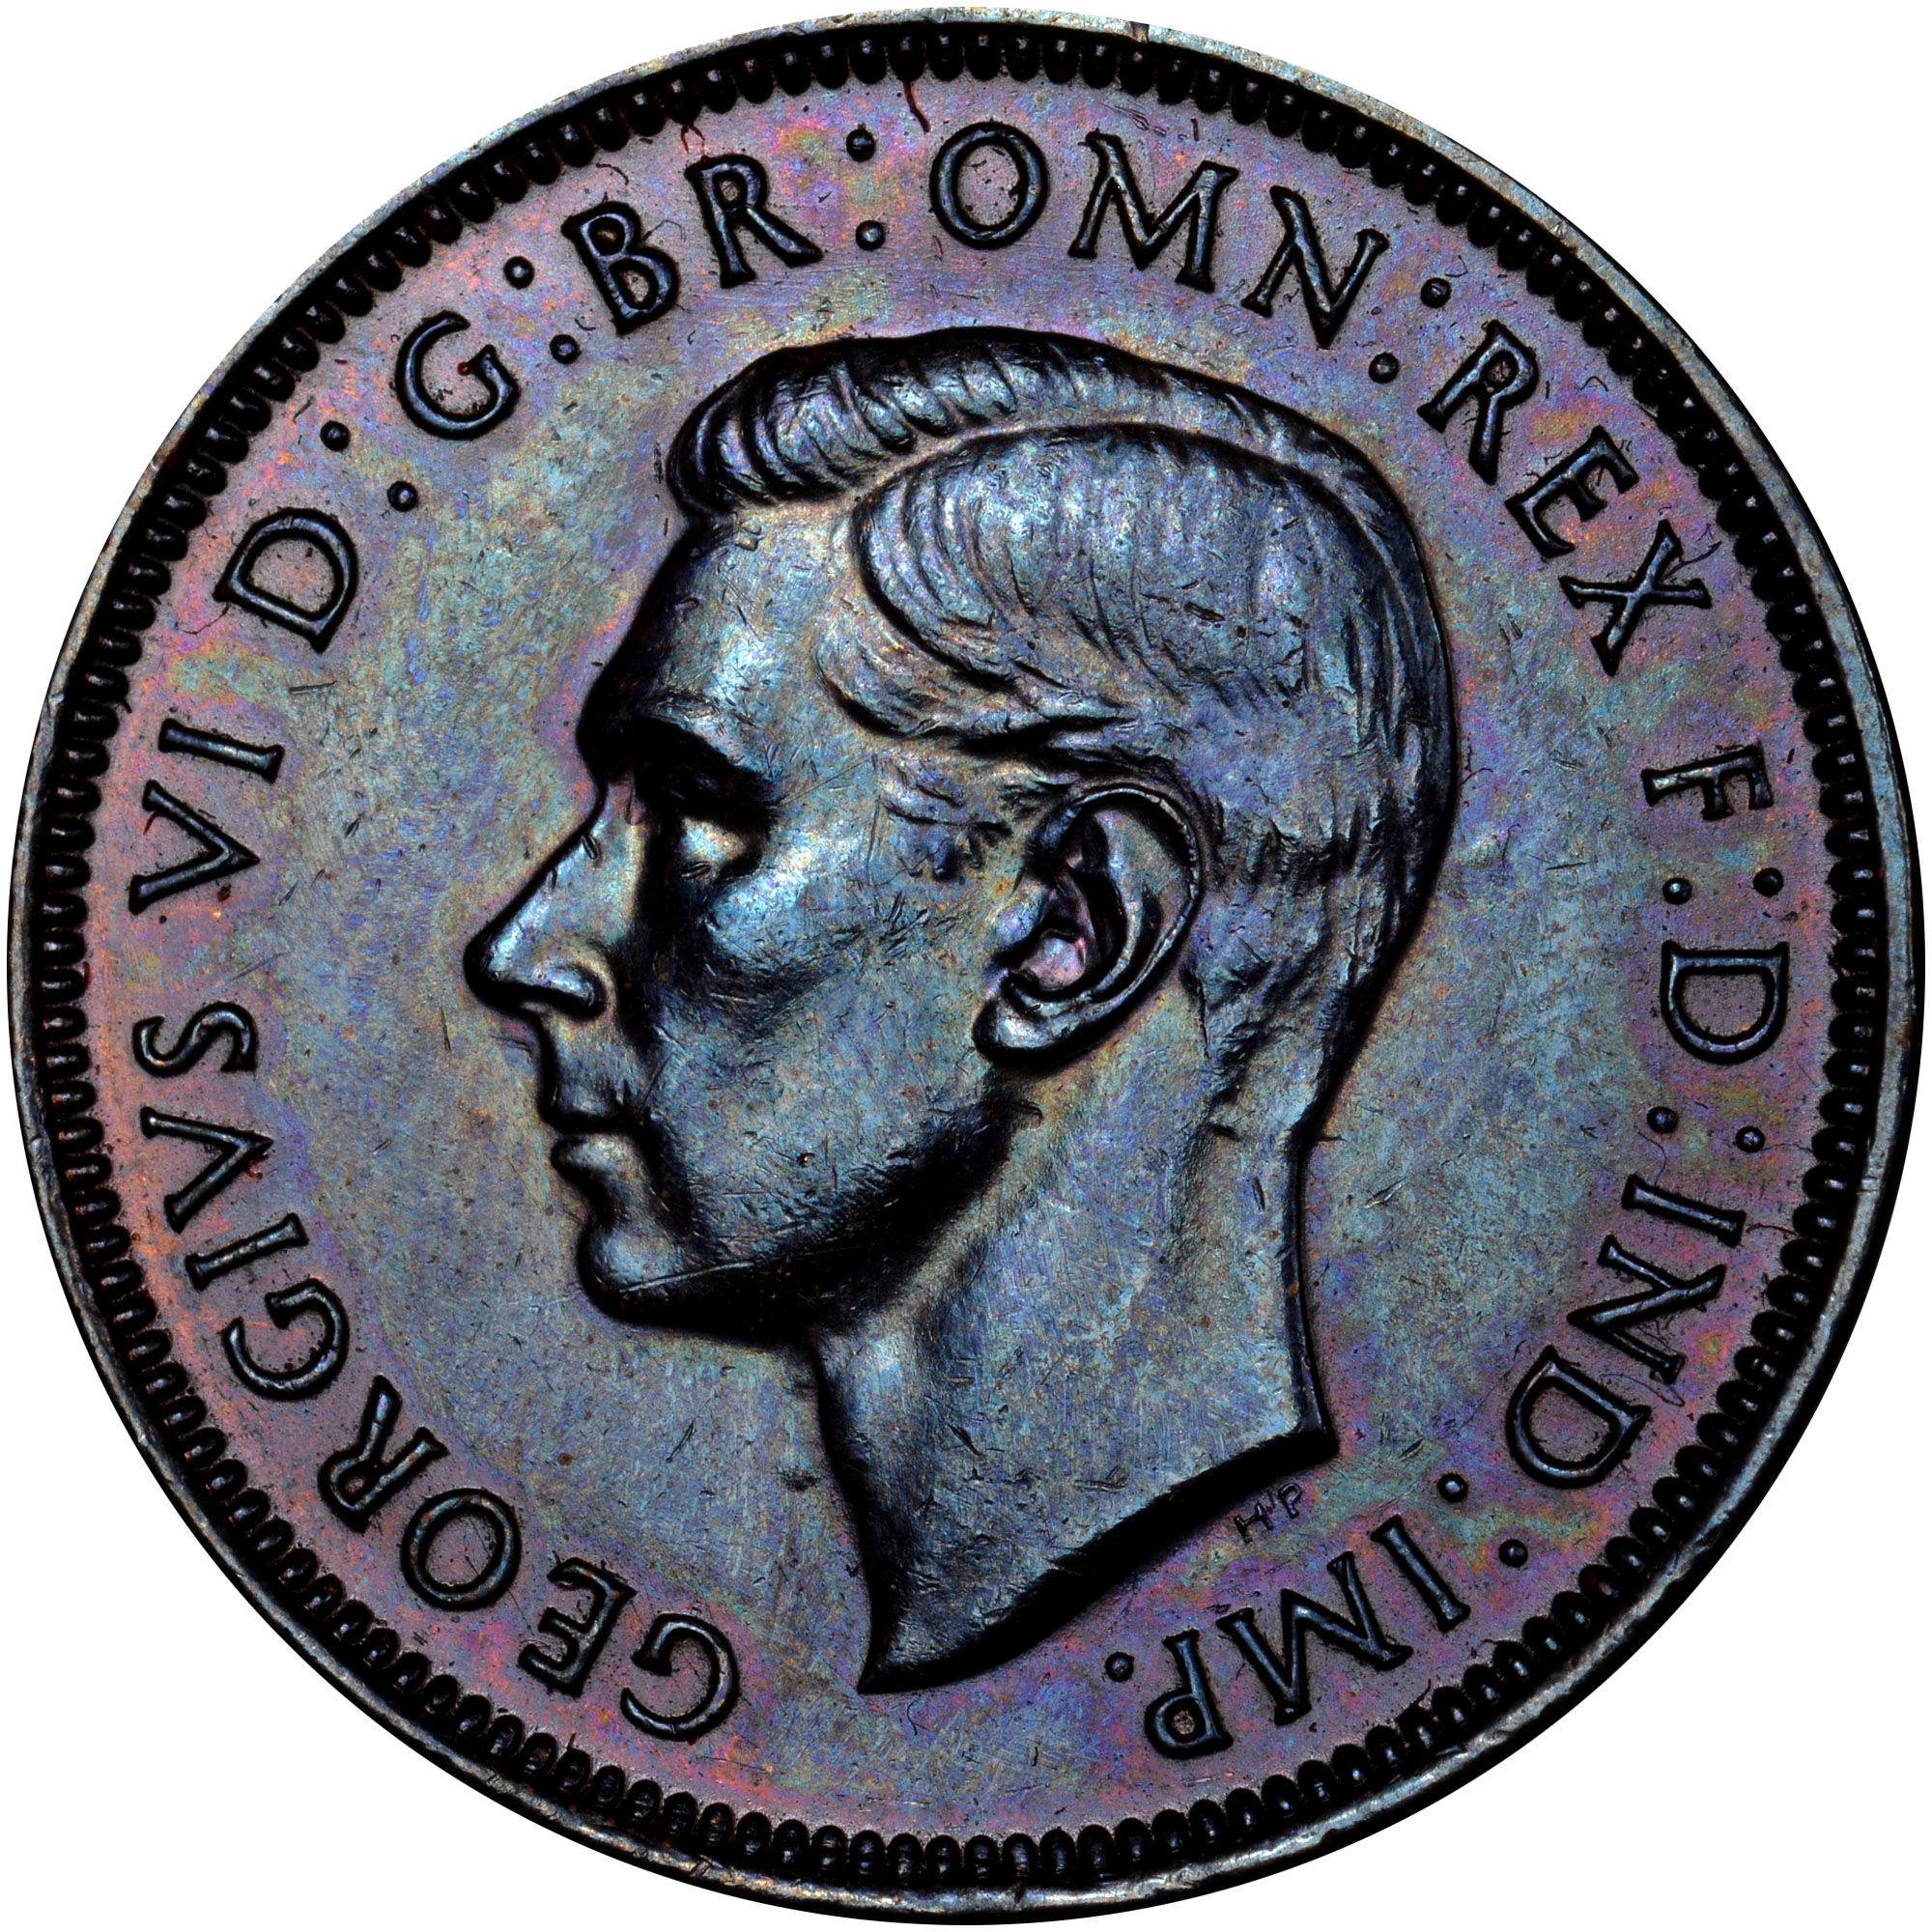 1938-1939 Australia 1/2 Penny obverse